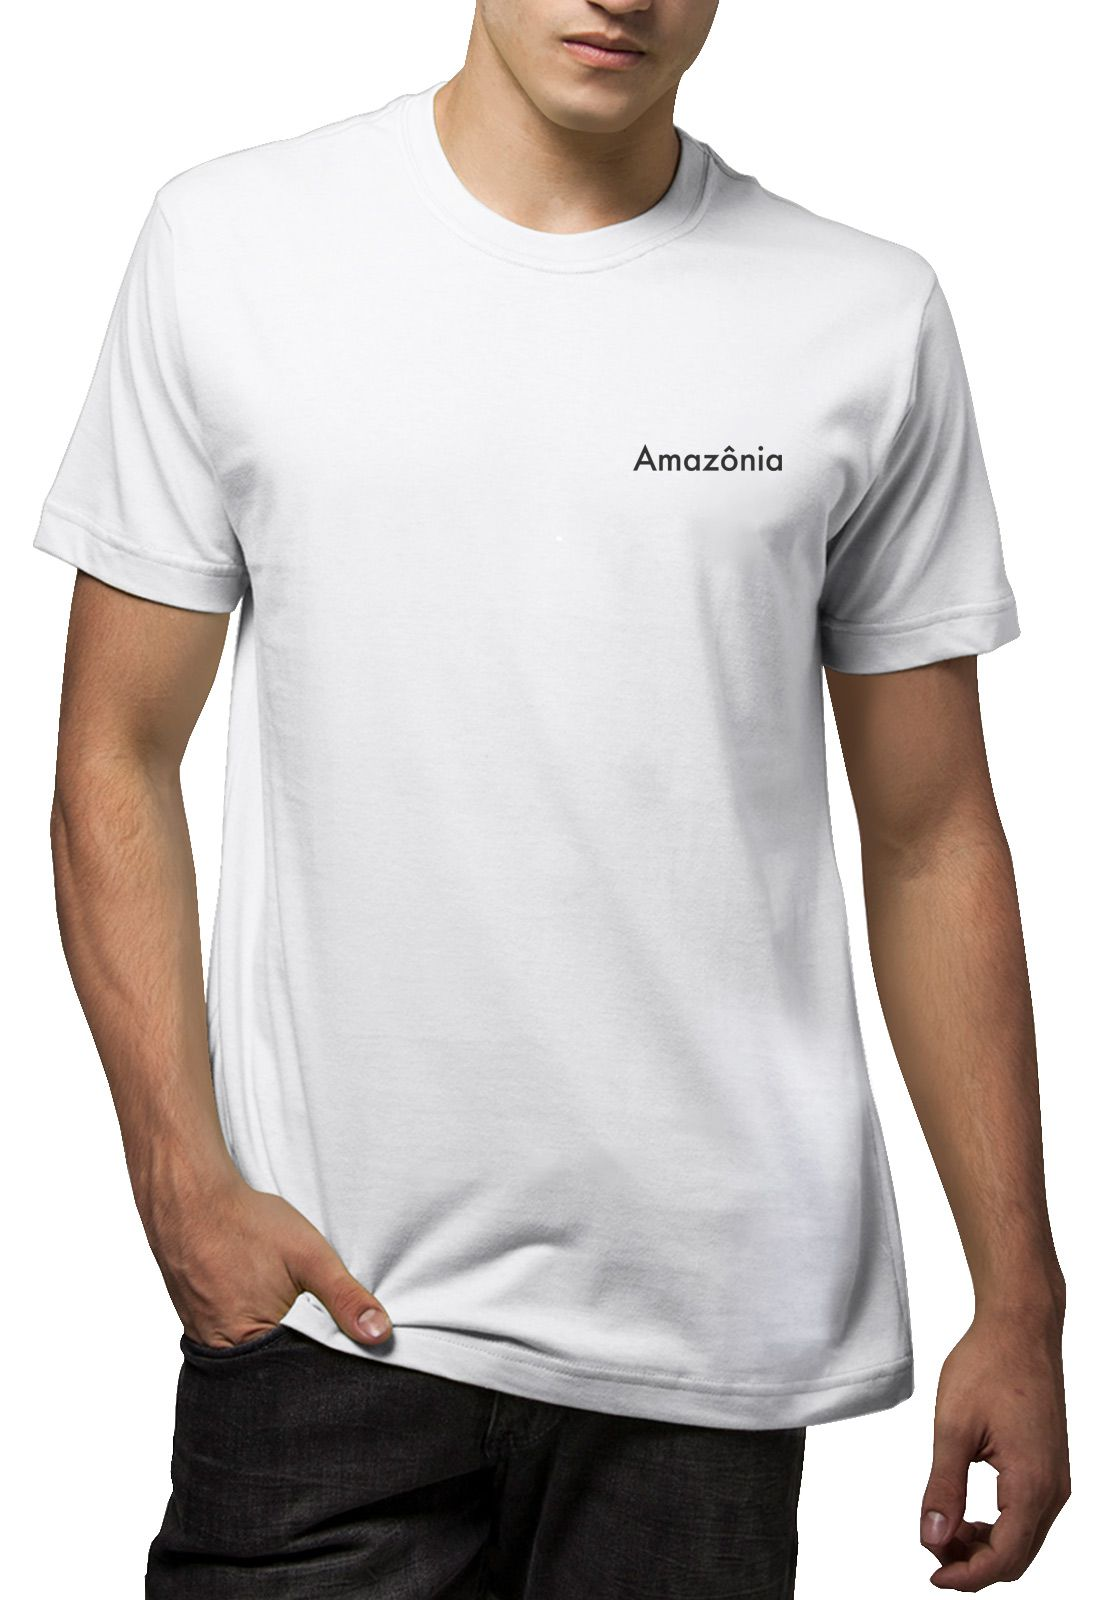 Camiseta Amazônia Pica Pau Grande Malhado - Branco